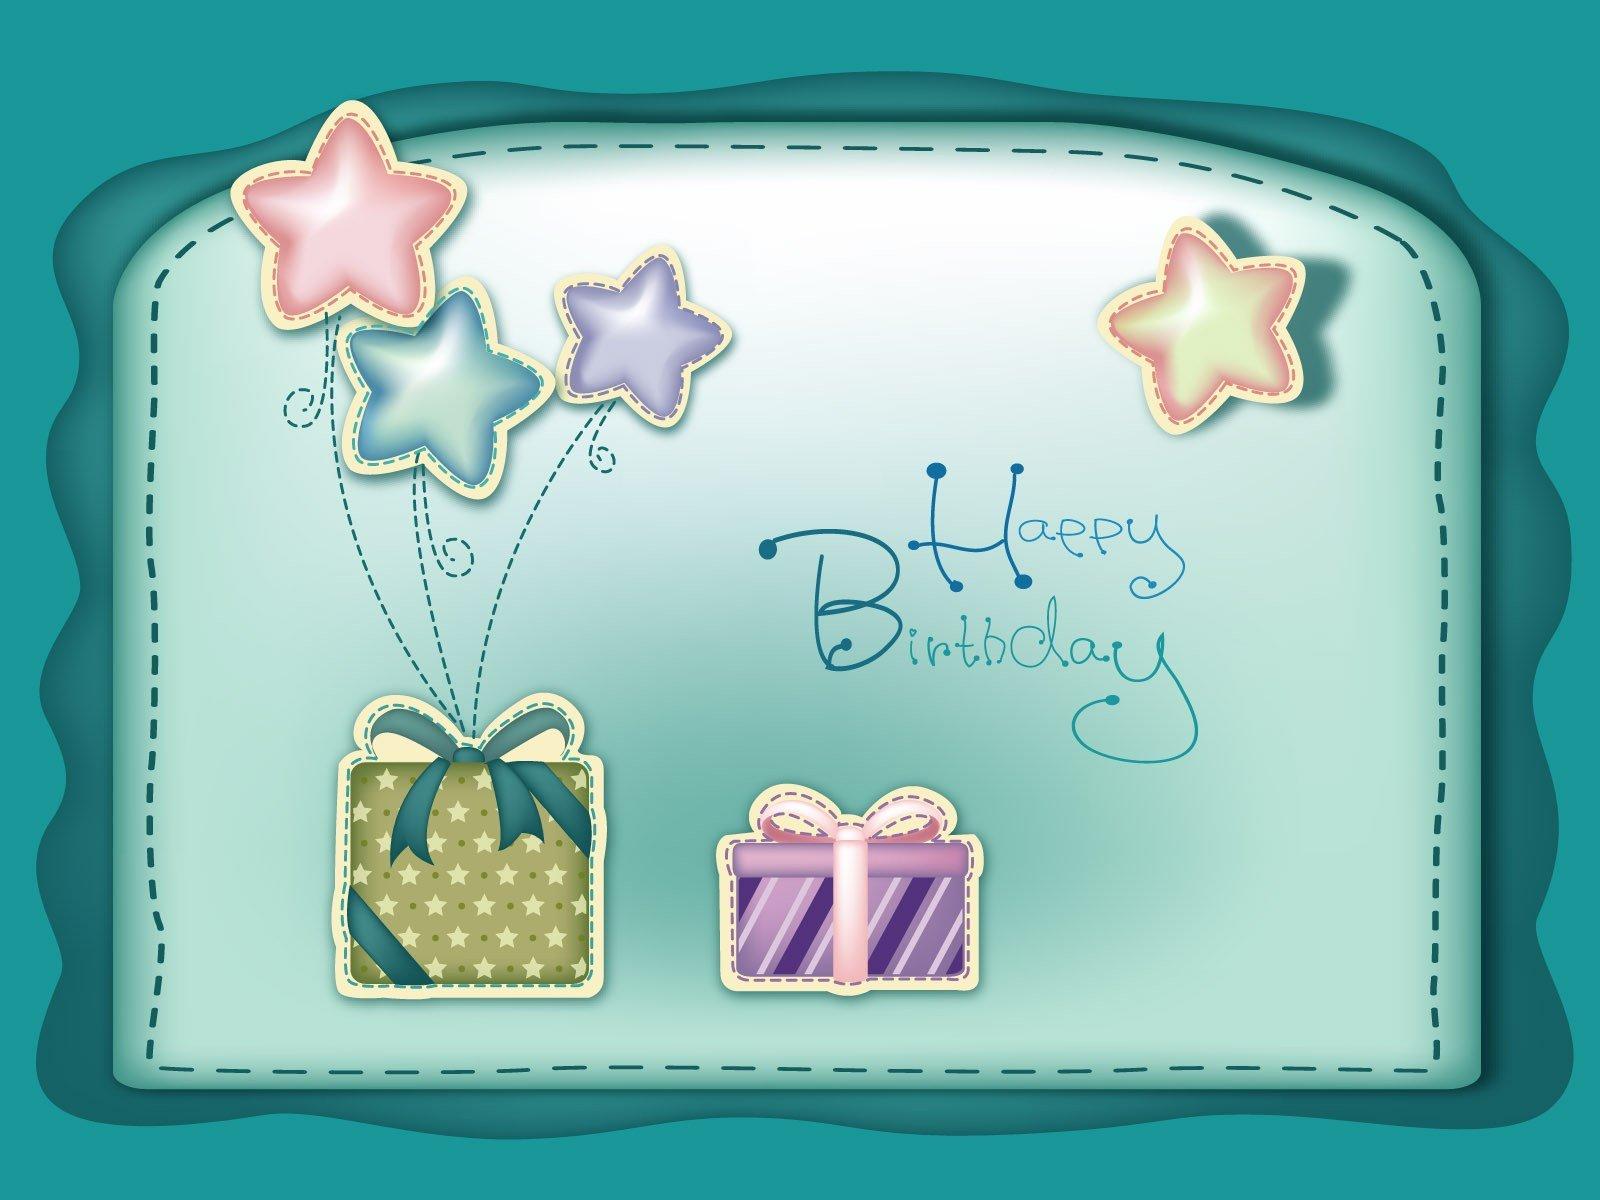 Happy Birthday WallpapersWallpaper Background Wallpaper Background 1600x1200